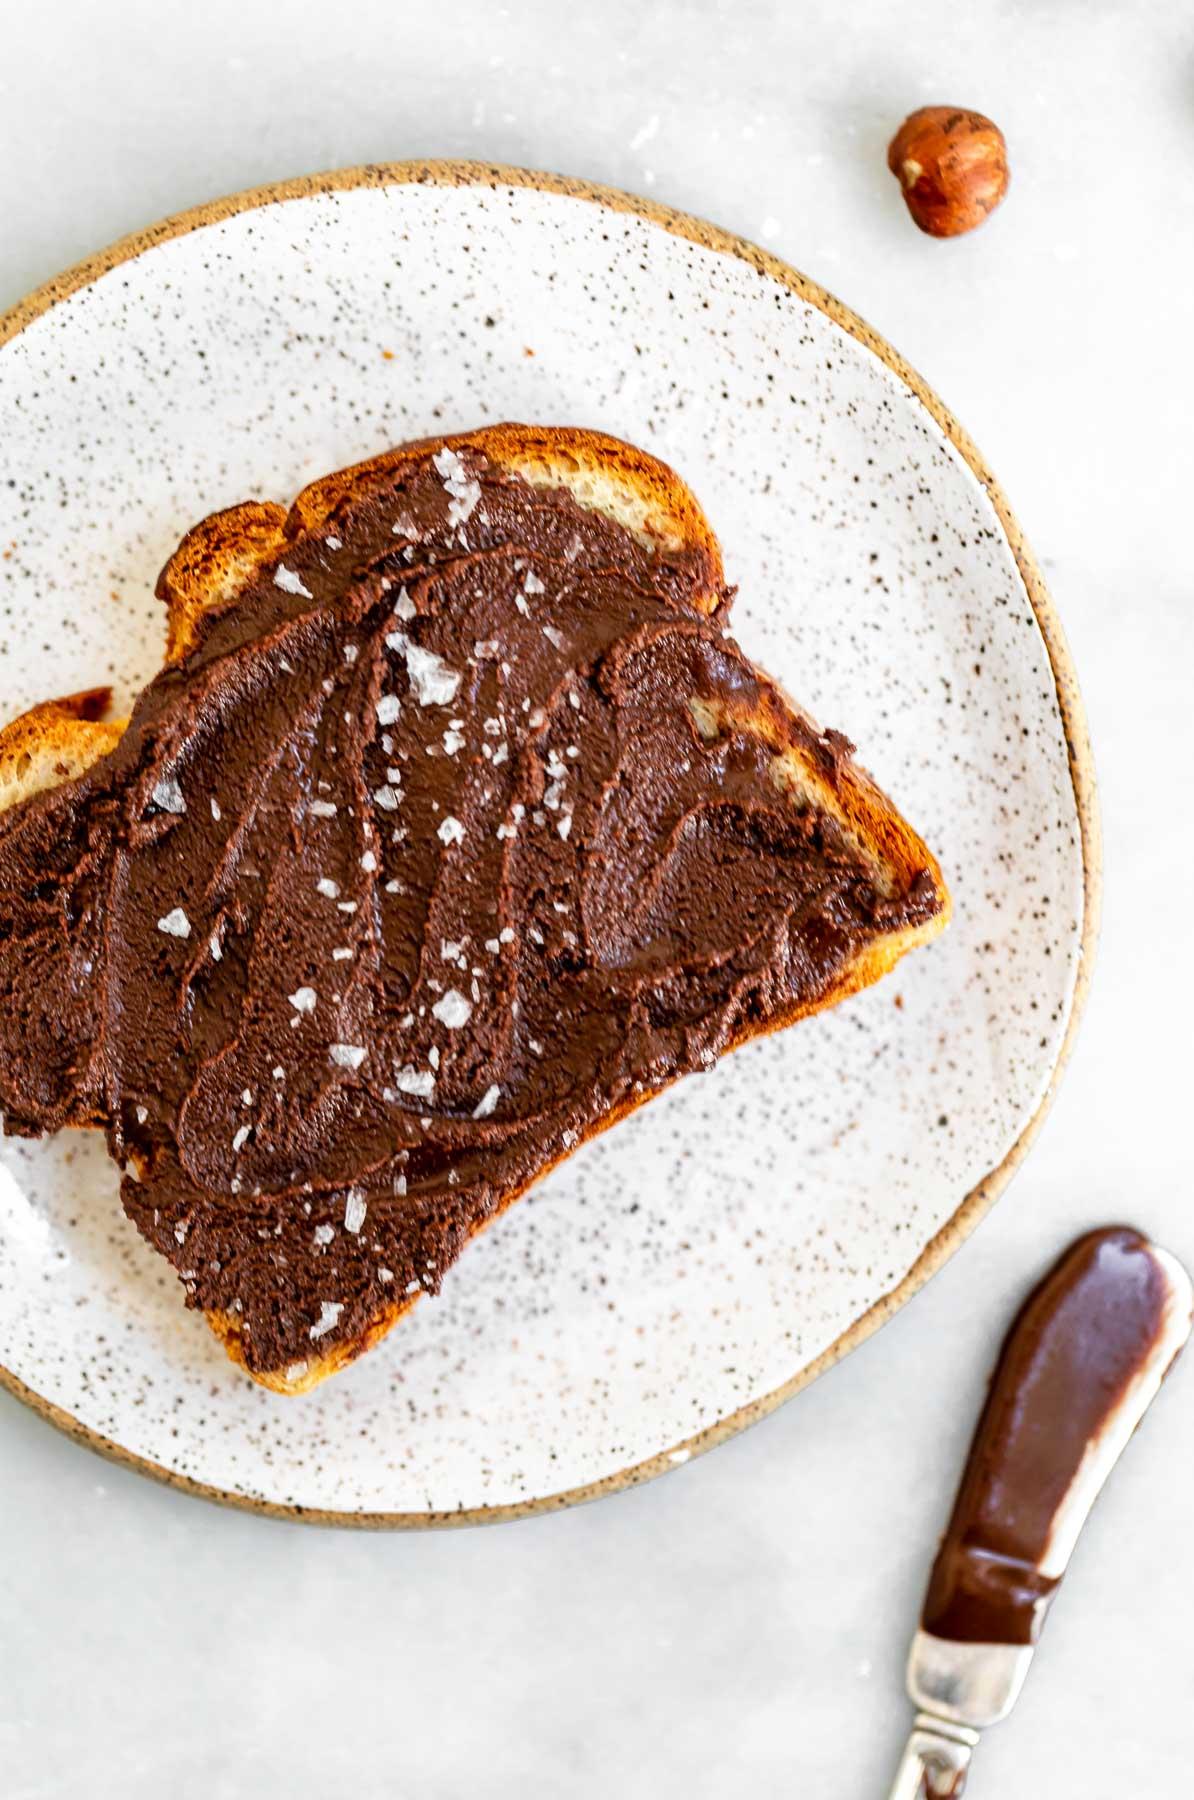 Vegan chocolate nutella on a piece of toast.